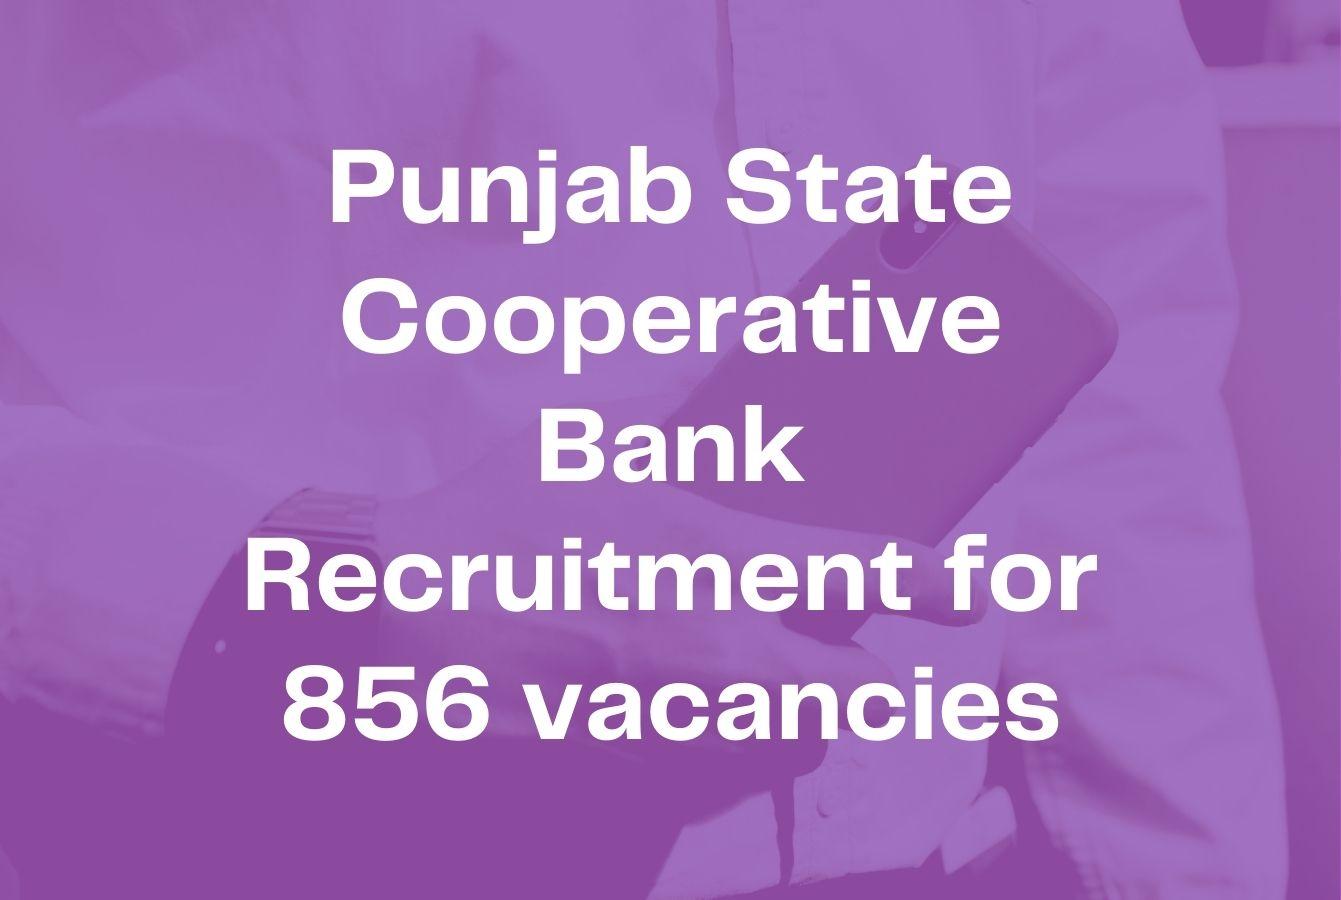 Punjab State Cooperative Bank Recruitment for 856 vacancies